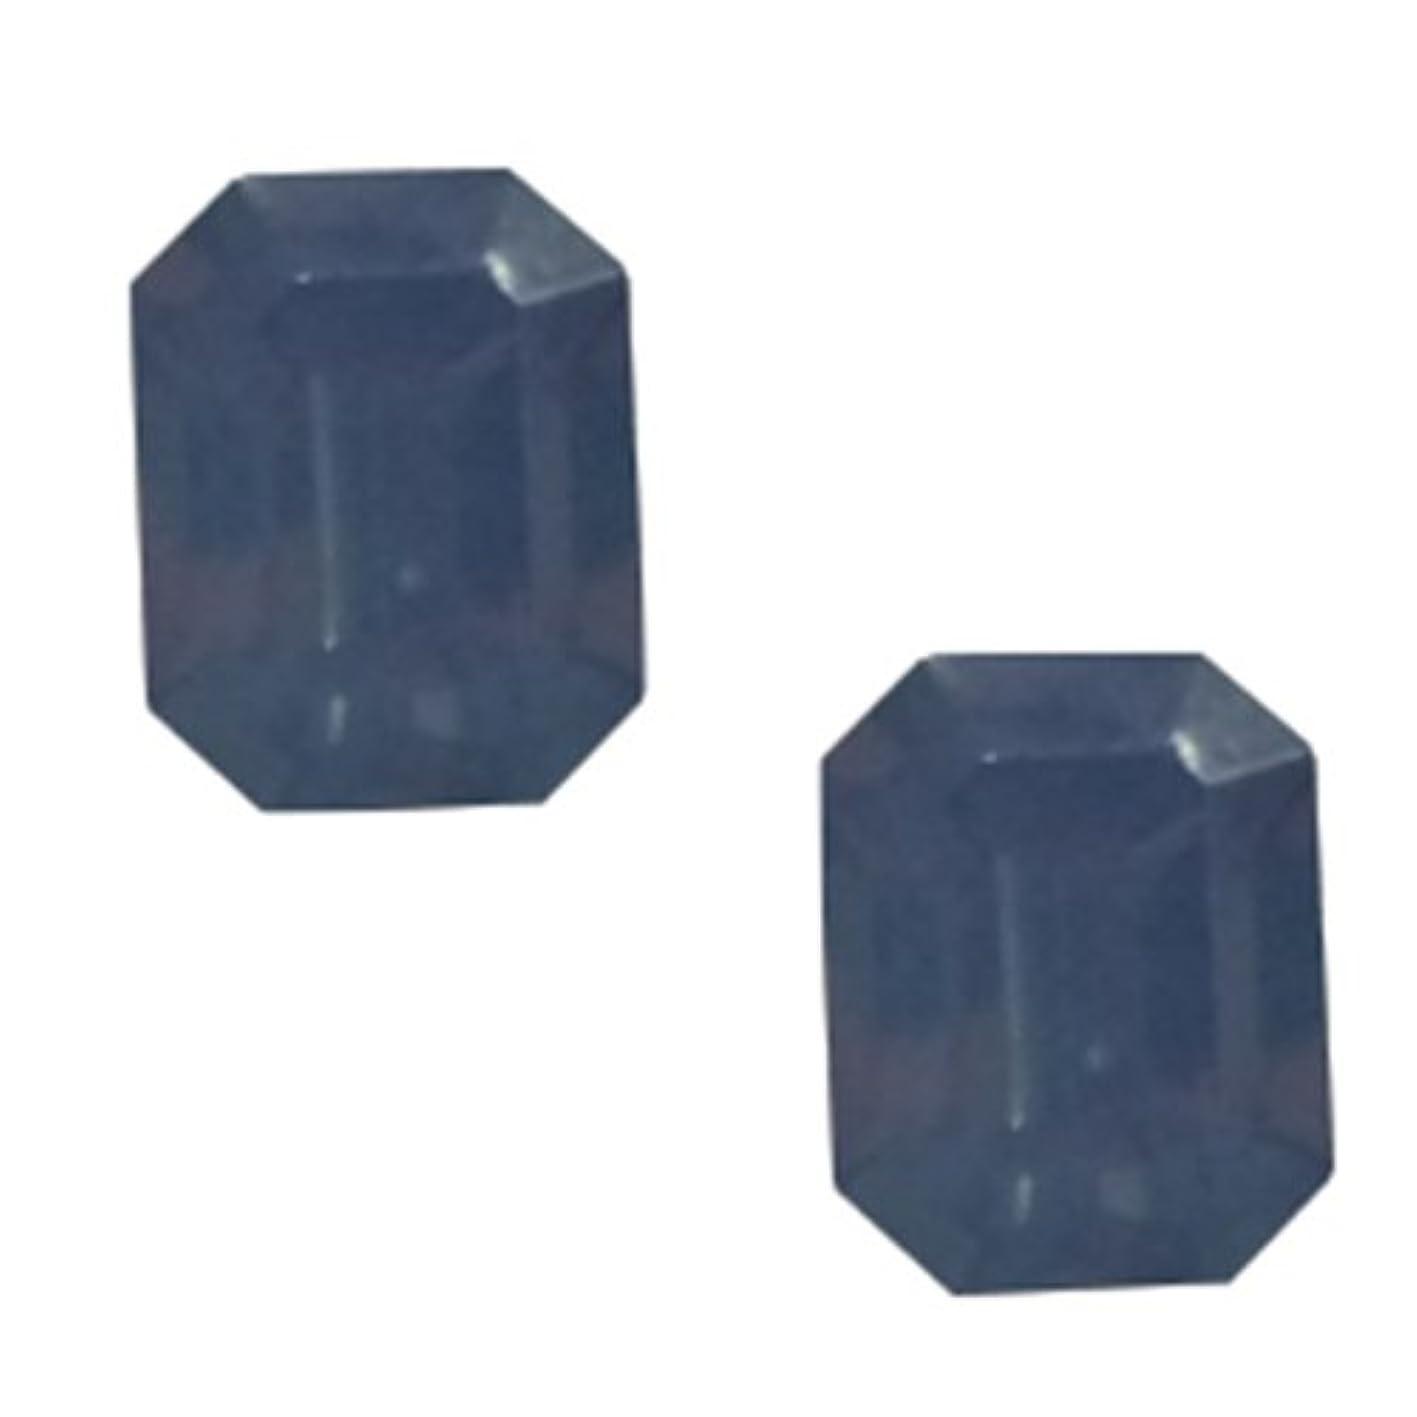 POSH ART ネイルパーツ長方形型 4*6mm 10P ブルーオパール